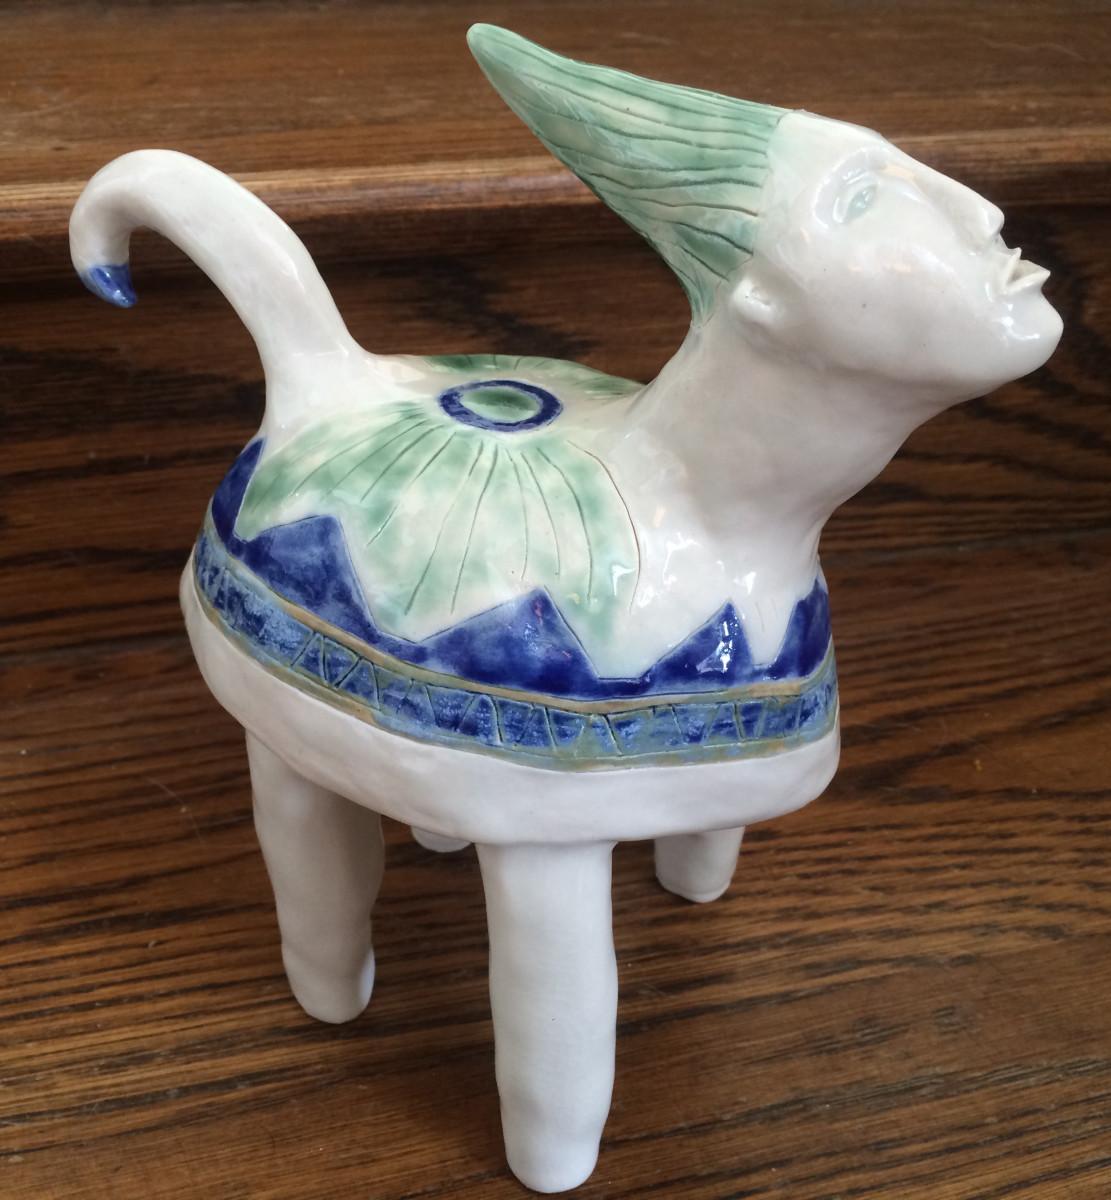 Inara, the unusual unicorn by Nell Eakin